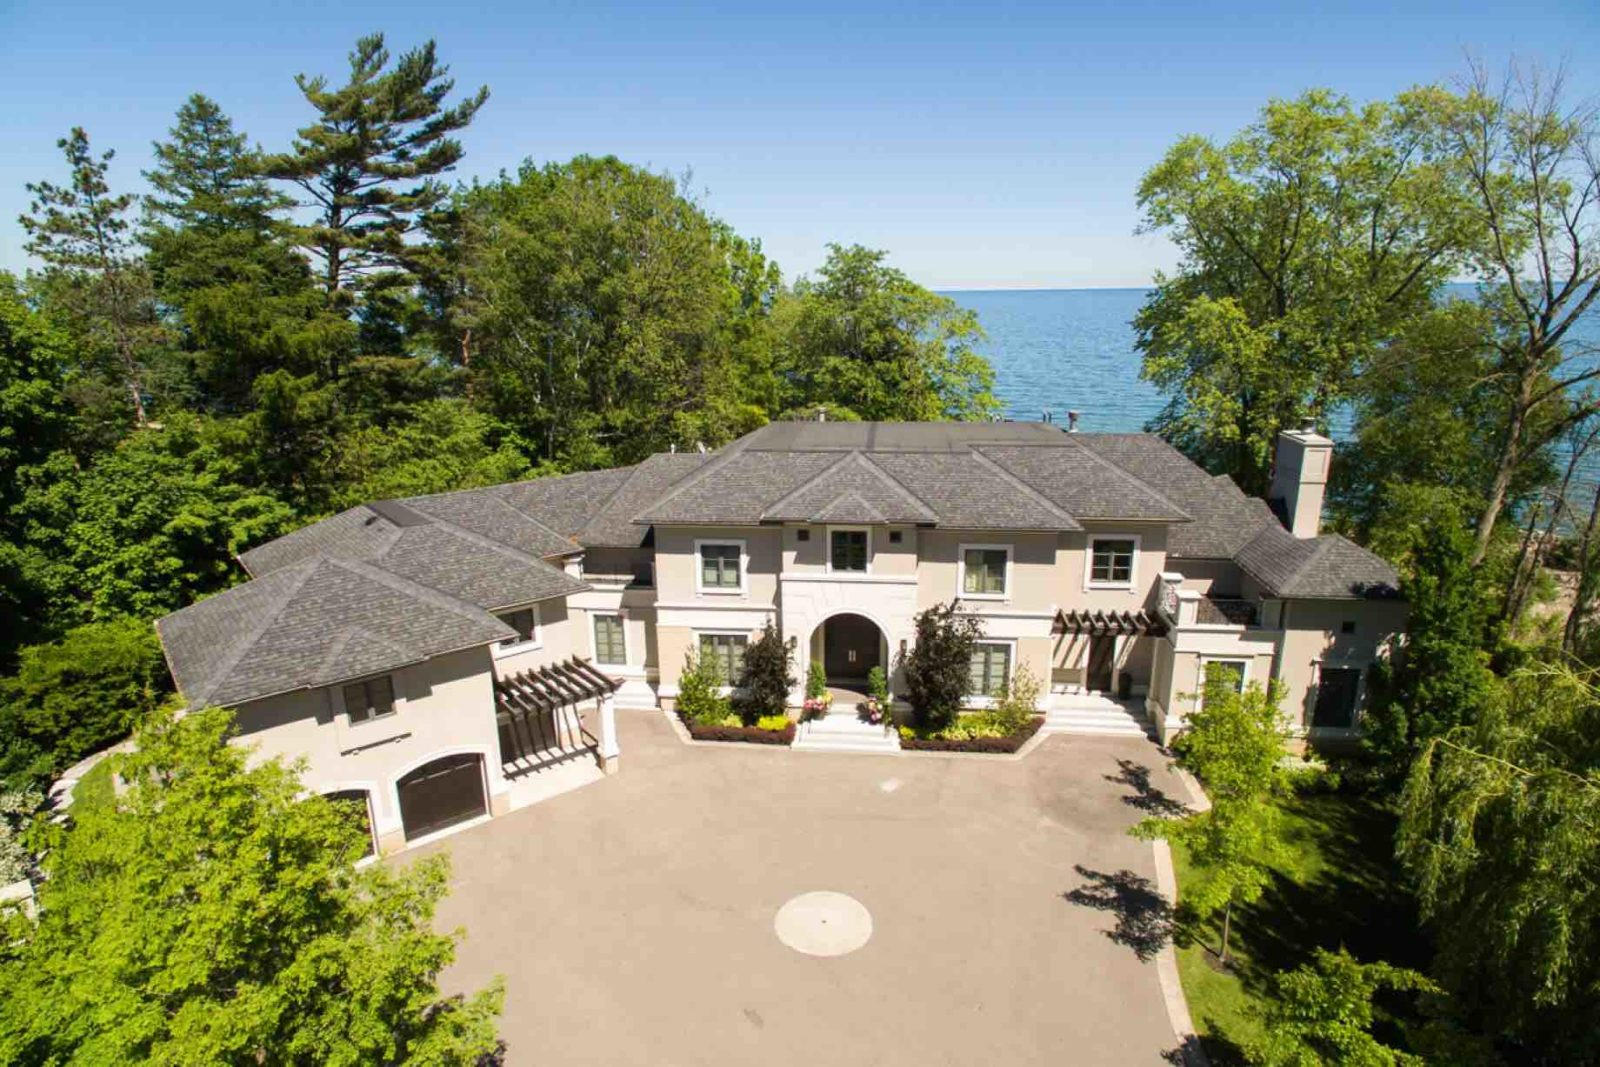 Luxury Lakefront Home exterior on Oakville Gold Coast of Lake Ontario